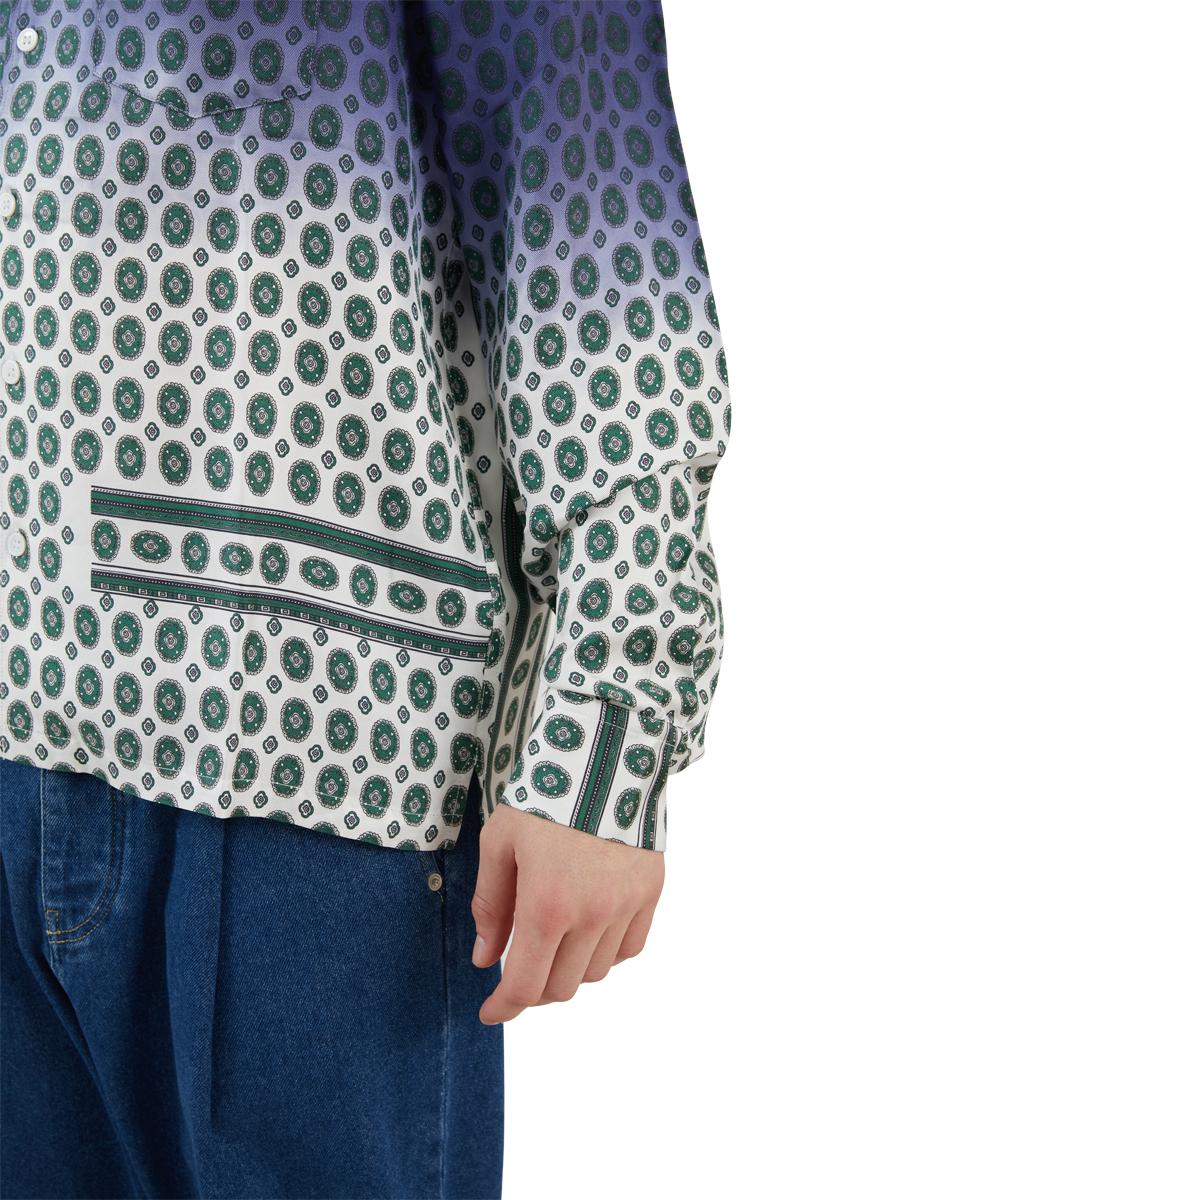 Soulland Joe Shirt